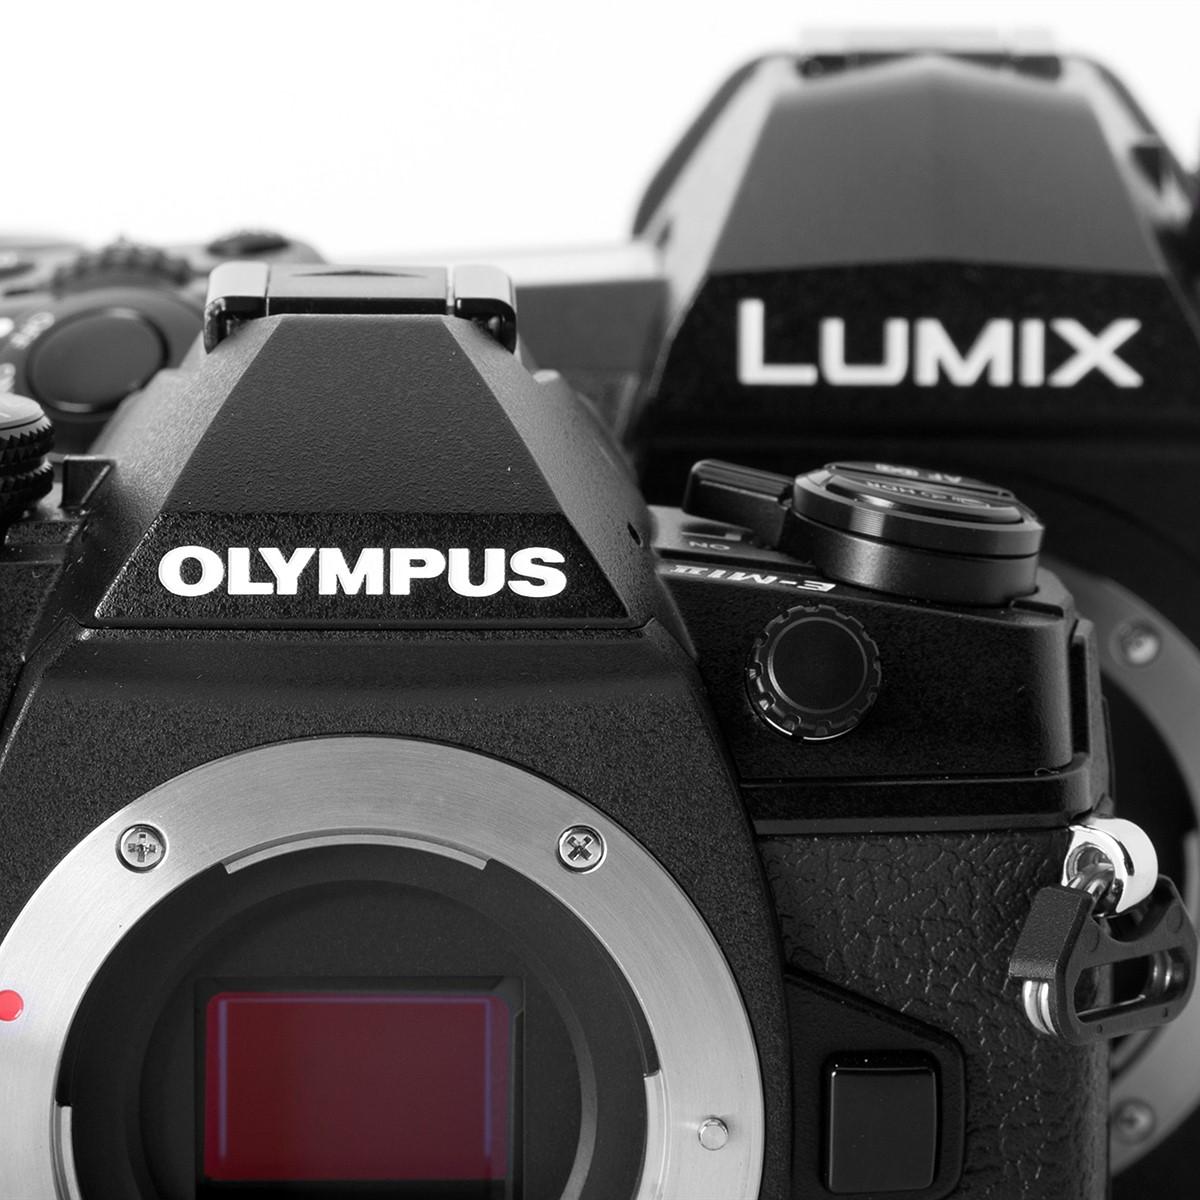 Panasonic Lumix G9 vs Olympus OM-D E-M1 II: Digital